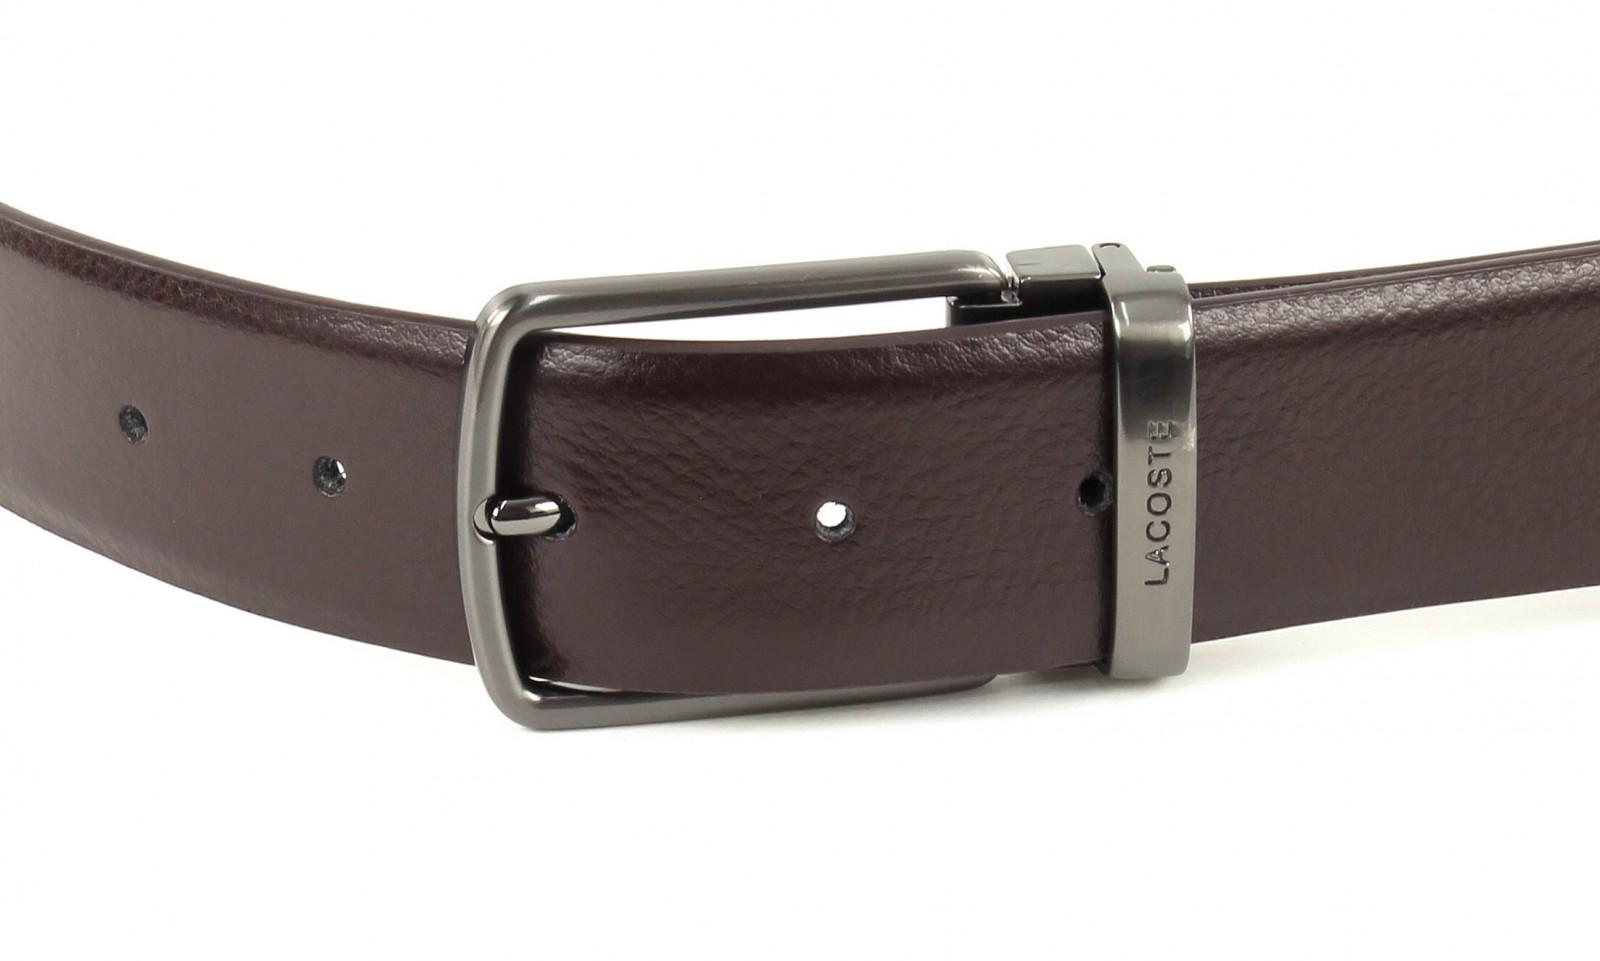 LACOSTE Curved Welded Belt W85 Brown